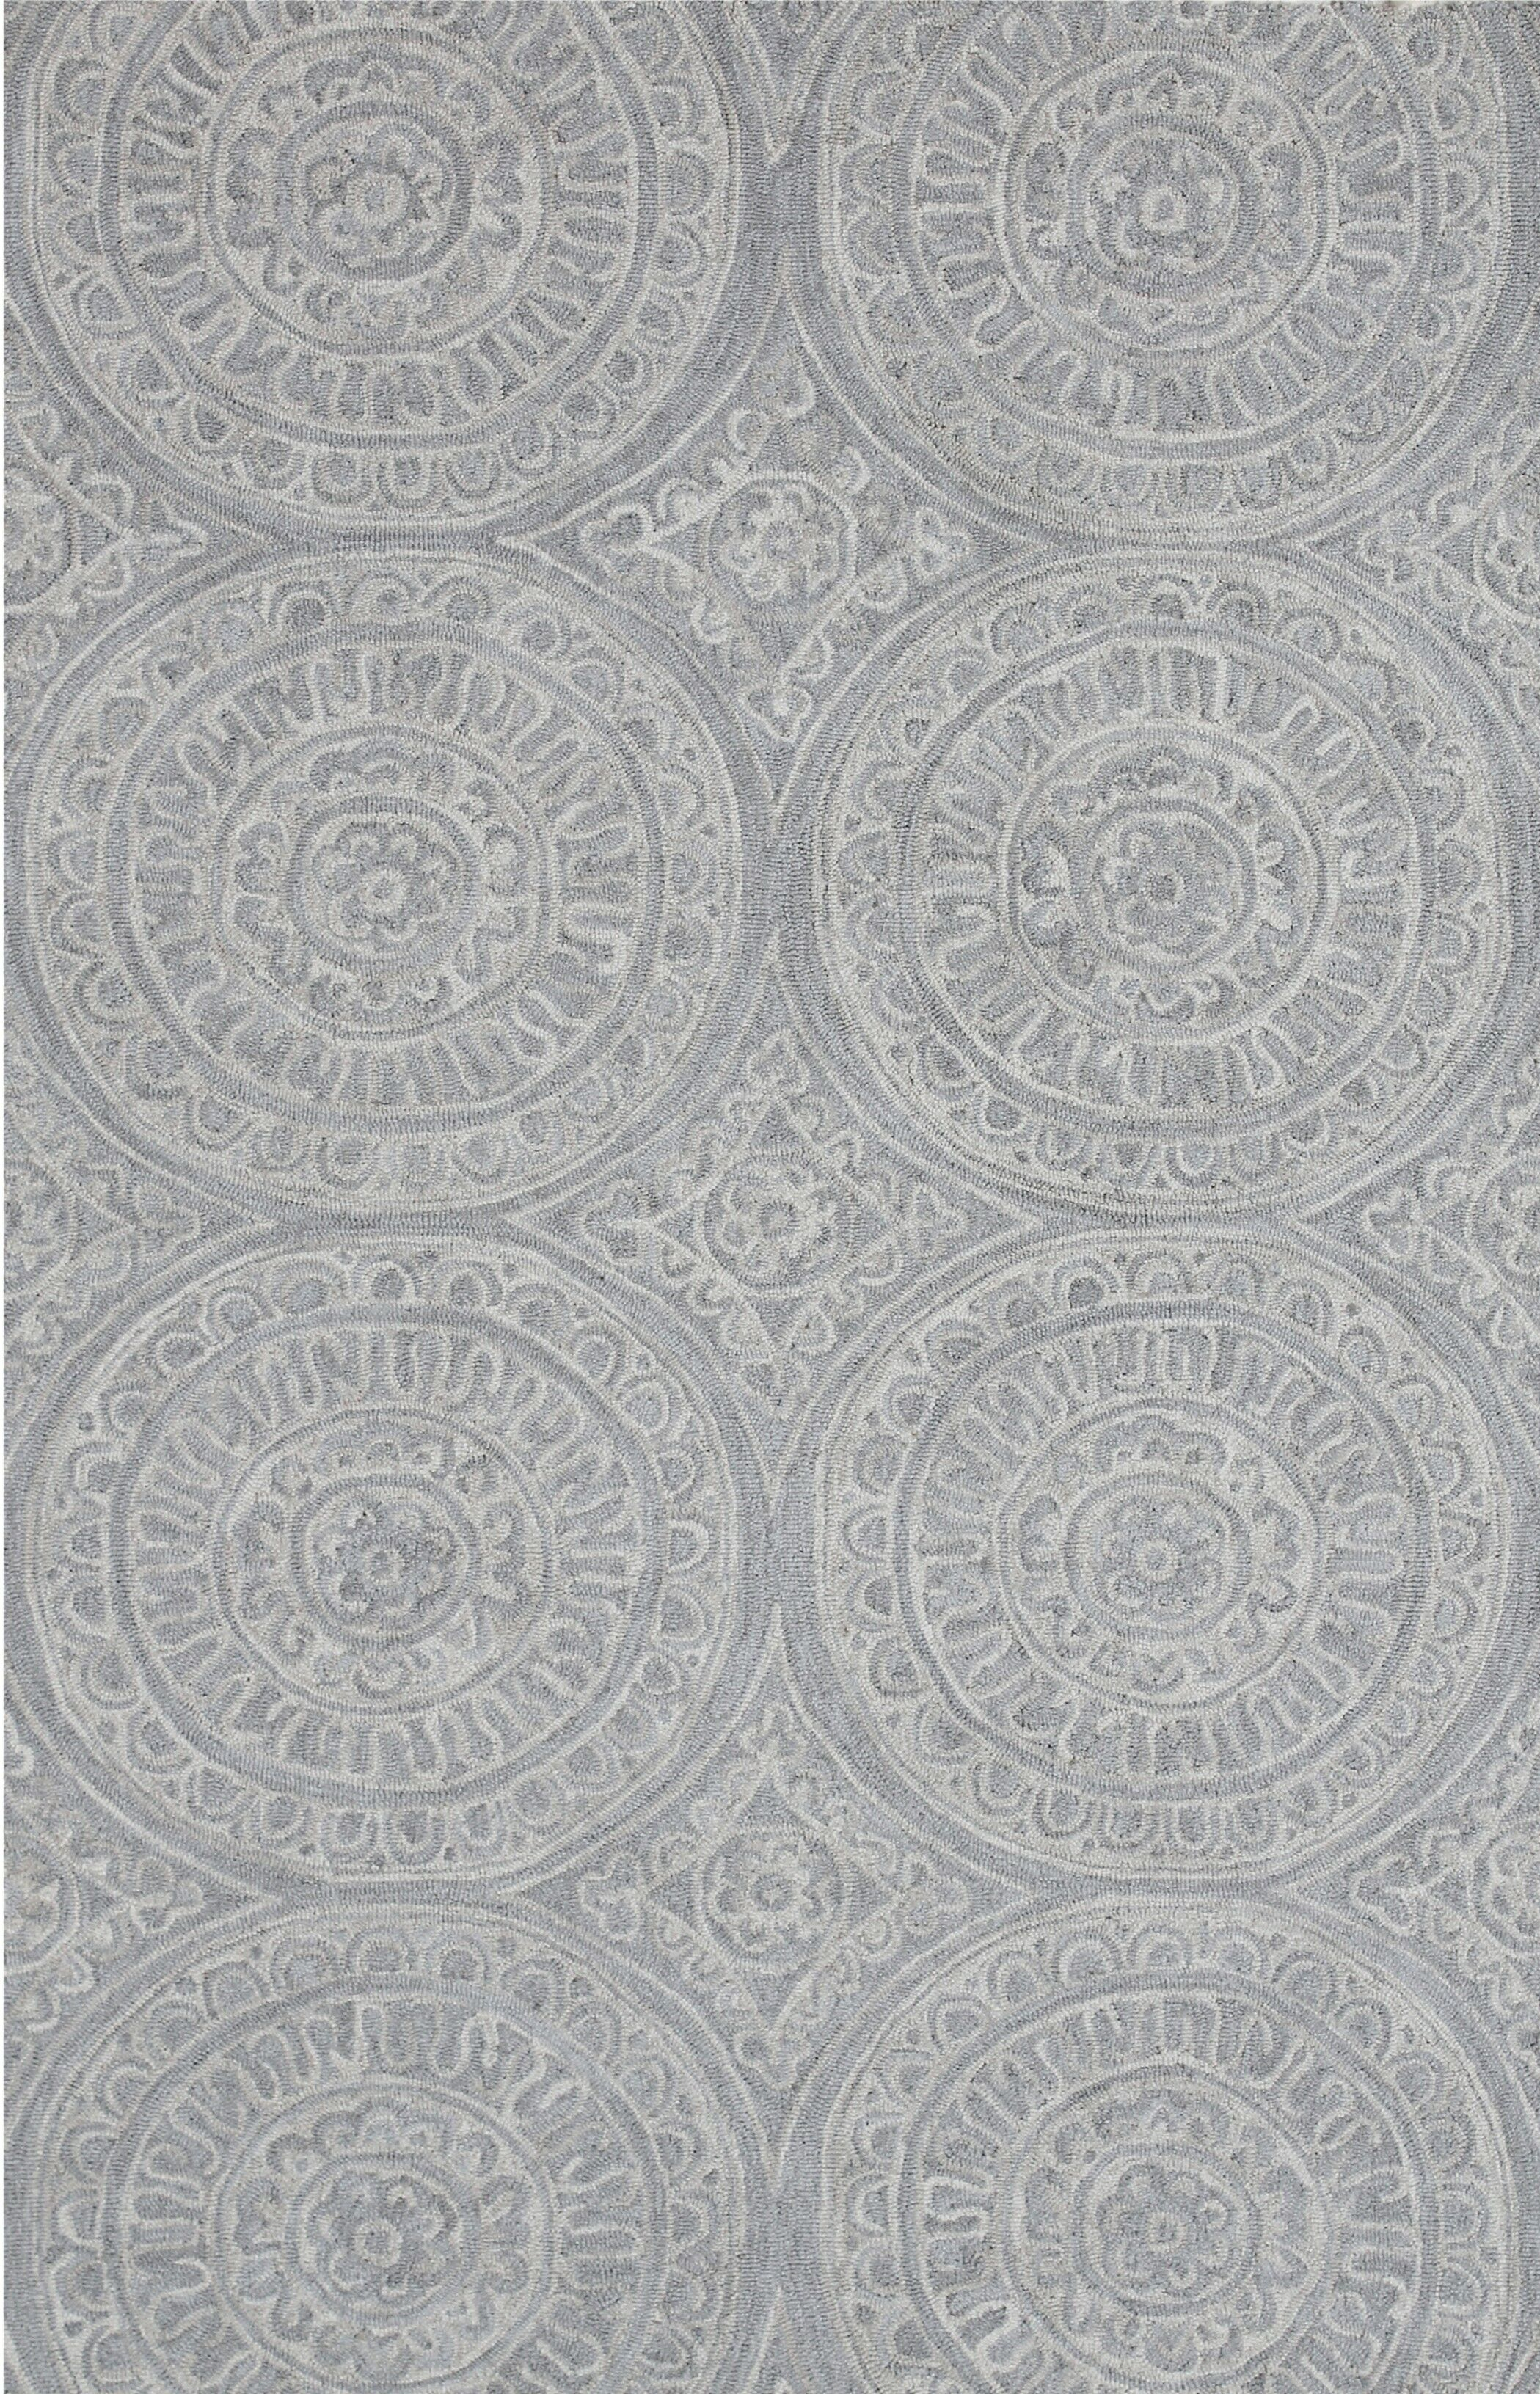 Galen Handmade Silver Area Rug Rug Size: Rectangle 3'3